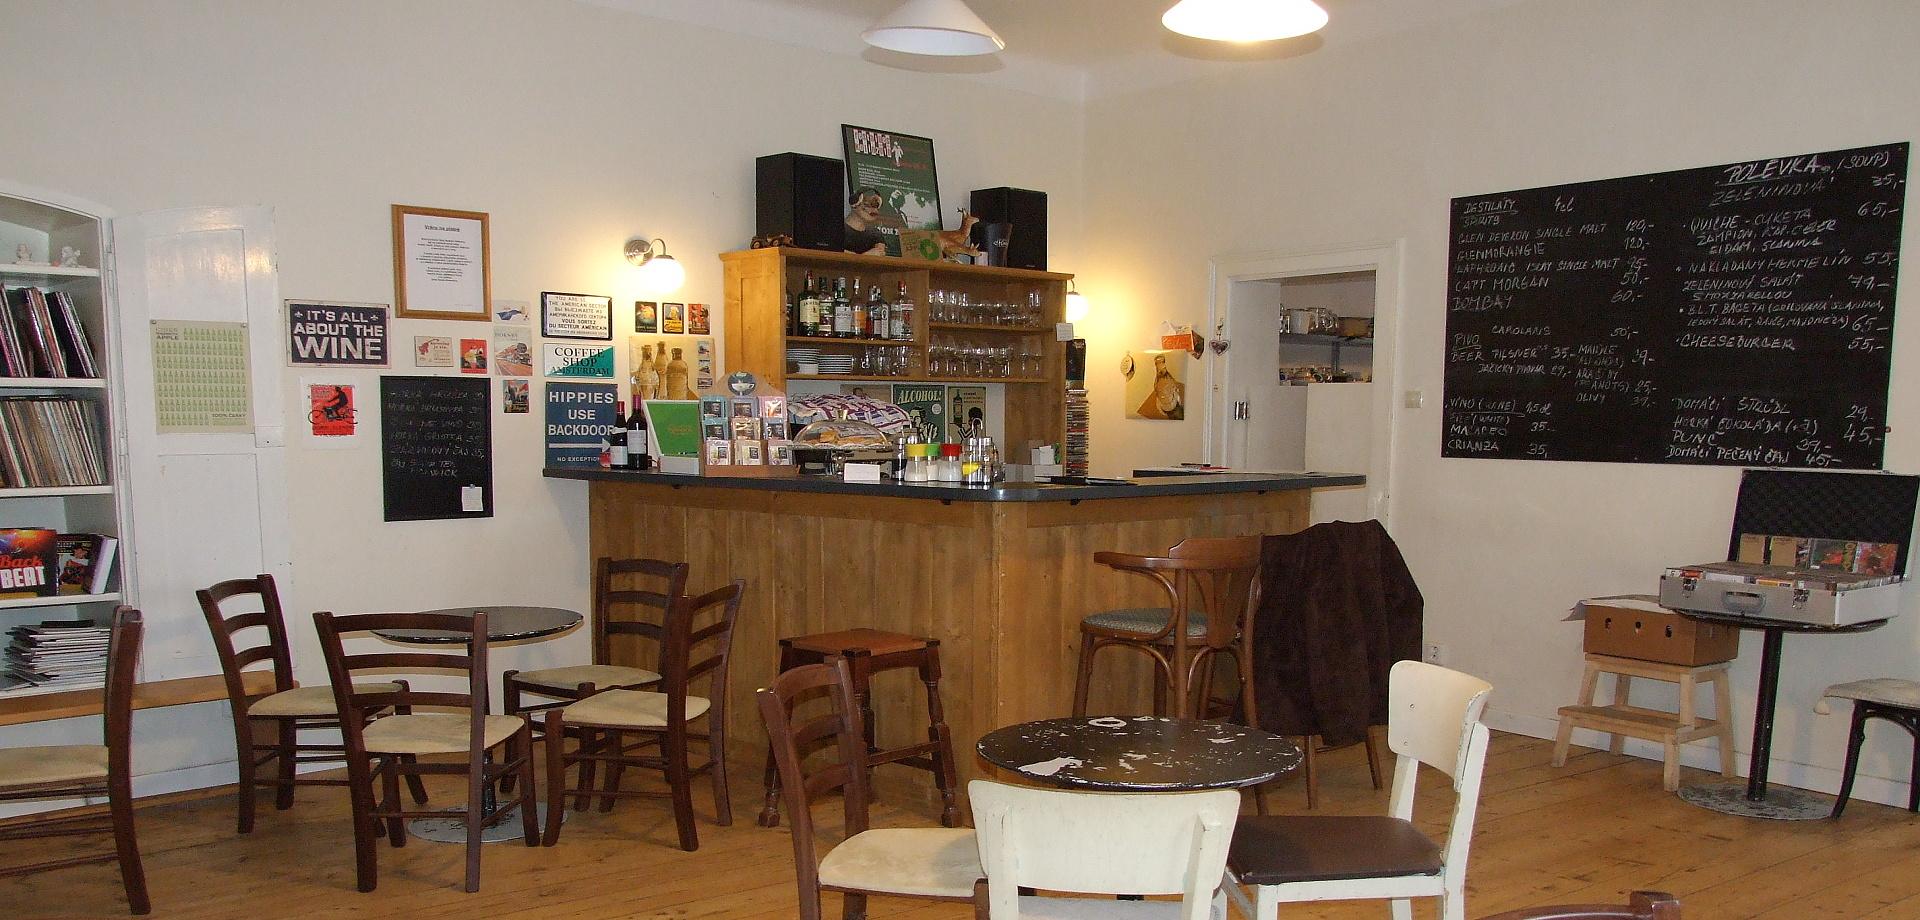 7964-blues-cafe-3.jpg